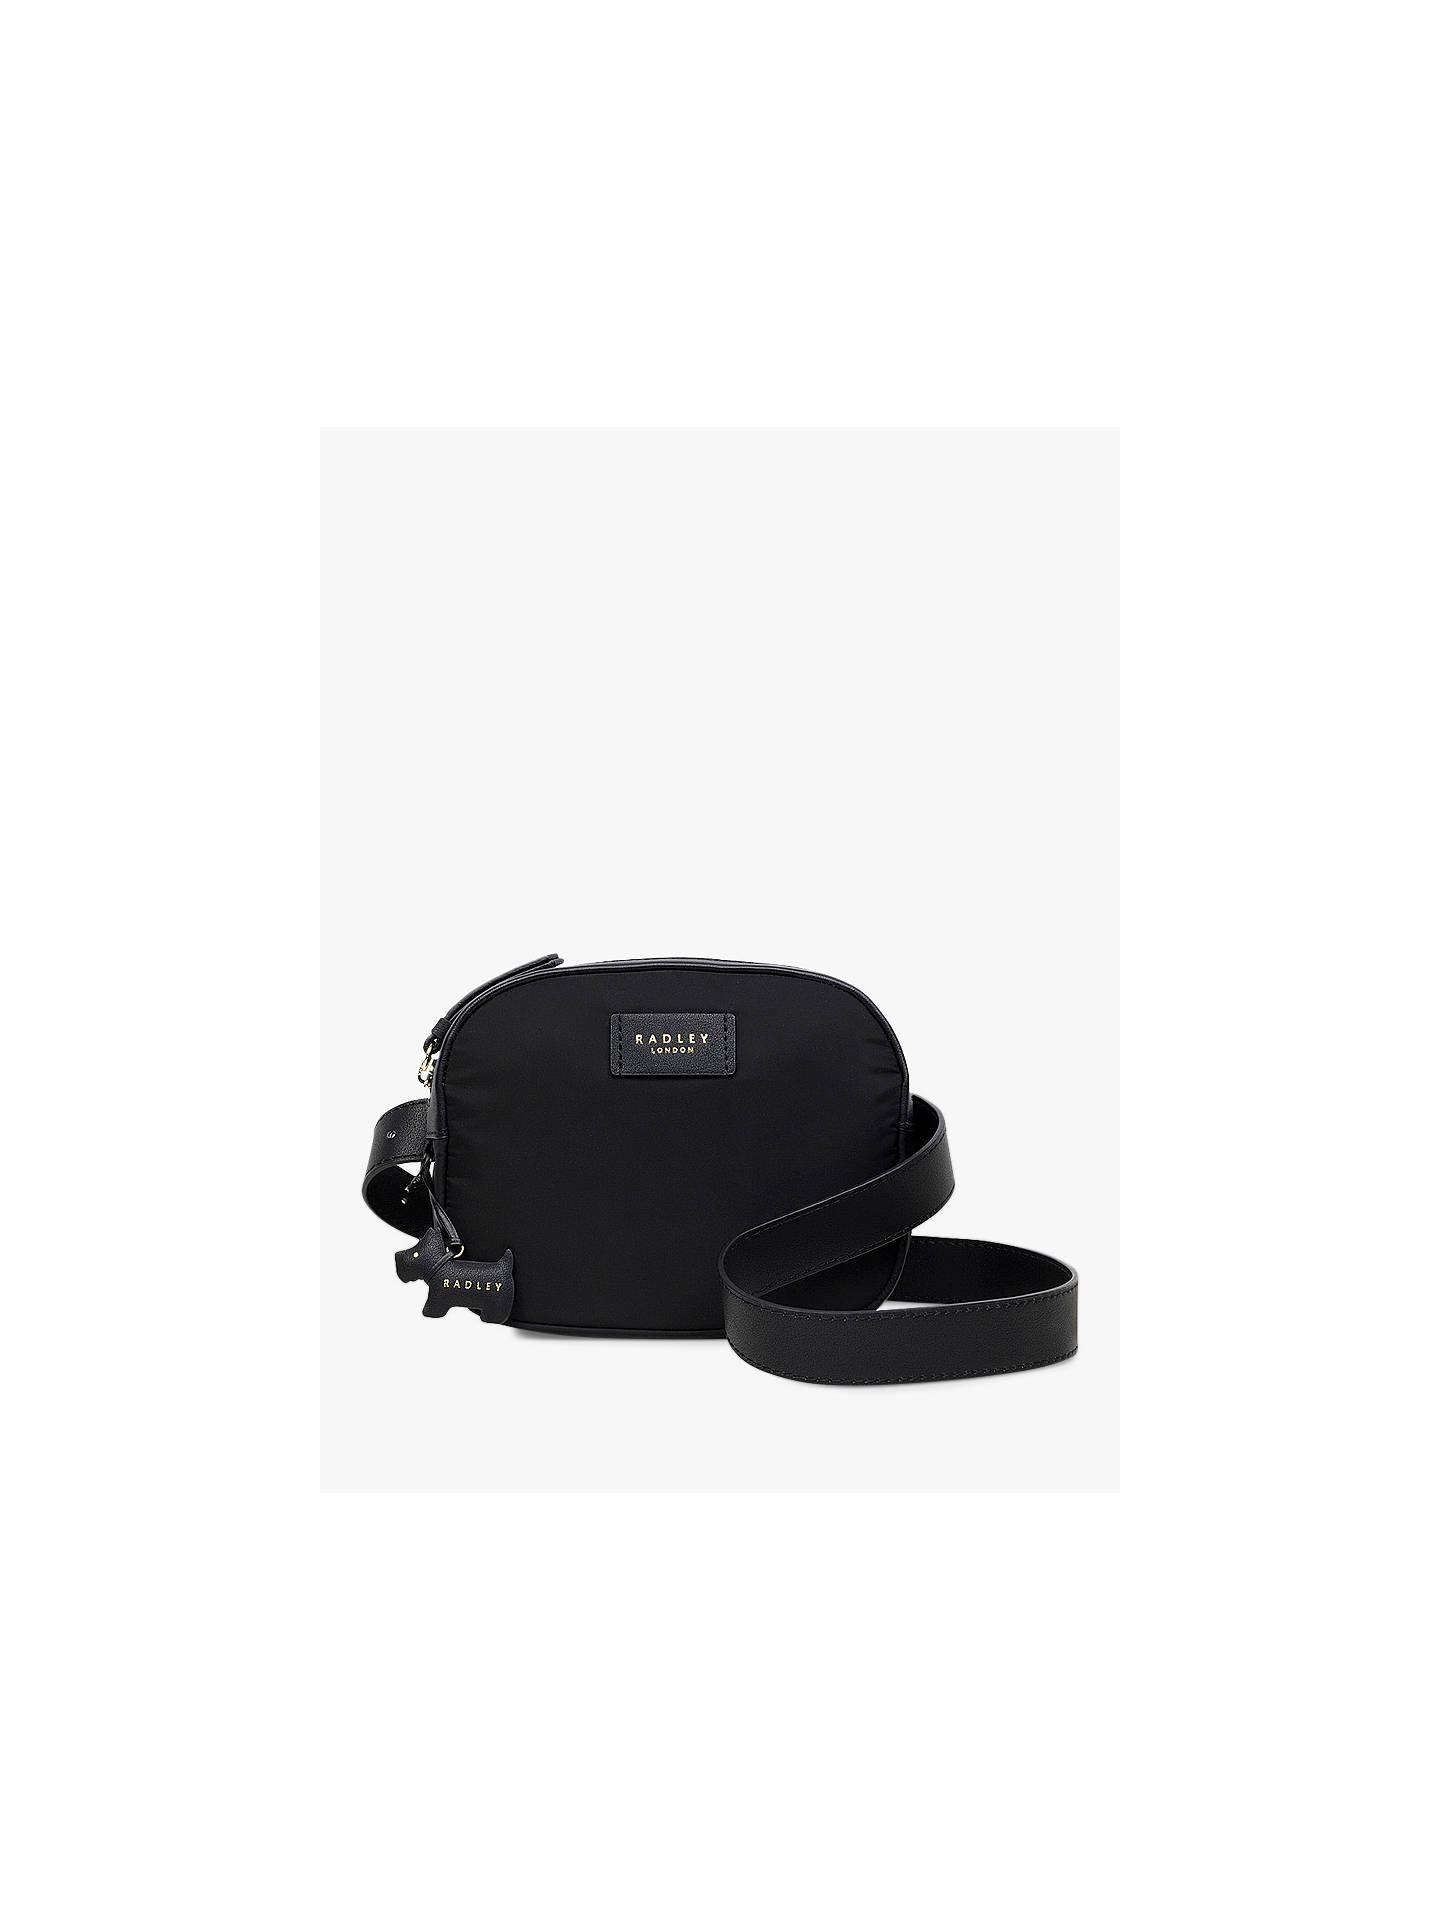 radley-winter-lane-bum-bag,-black by radley